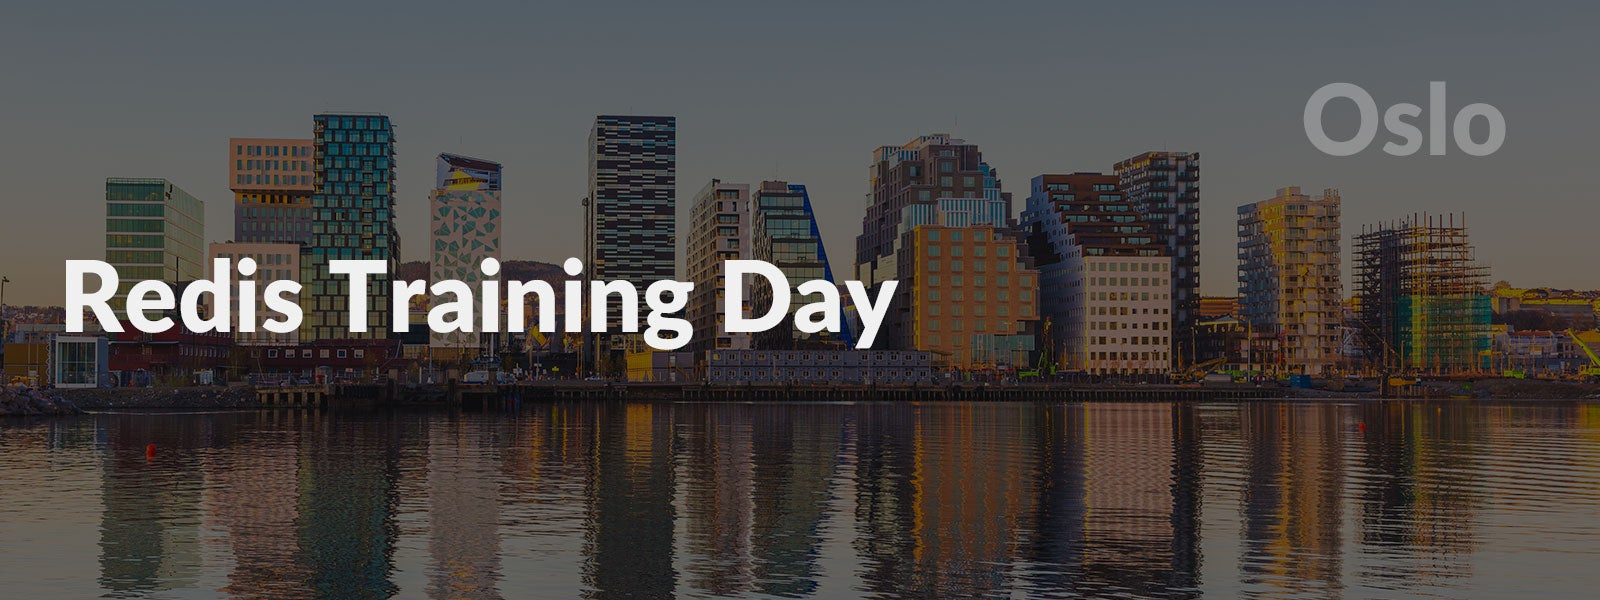 Redis Training Day Oslo